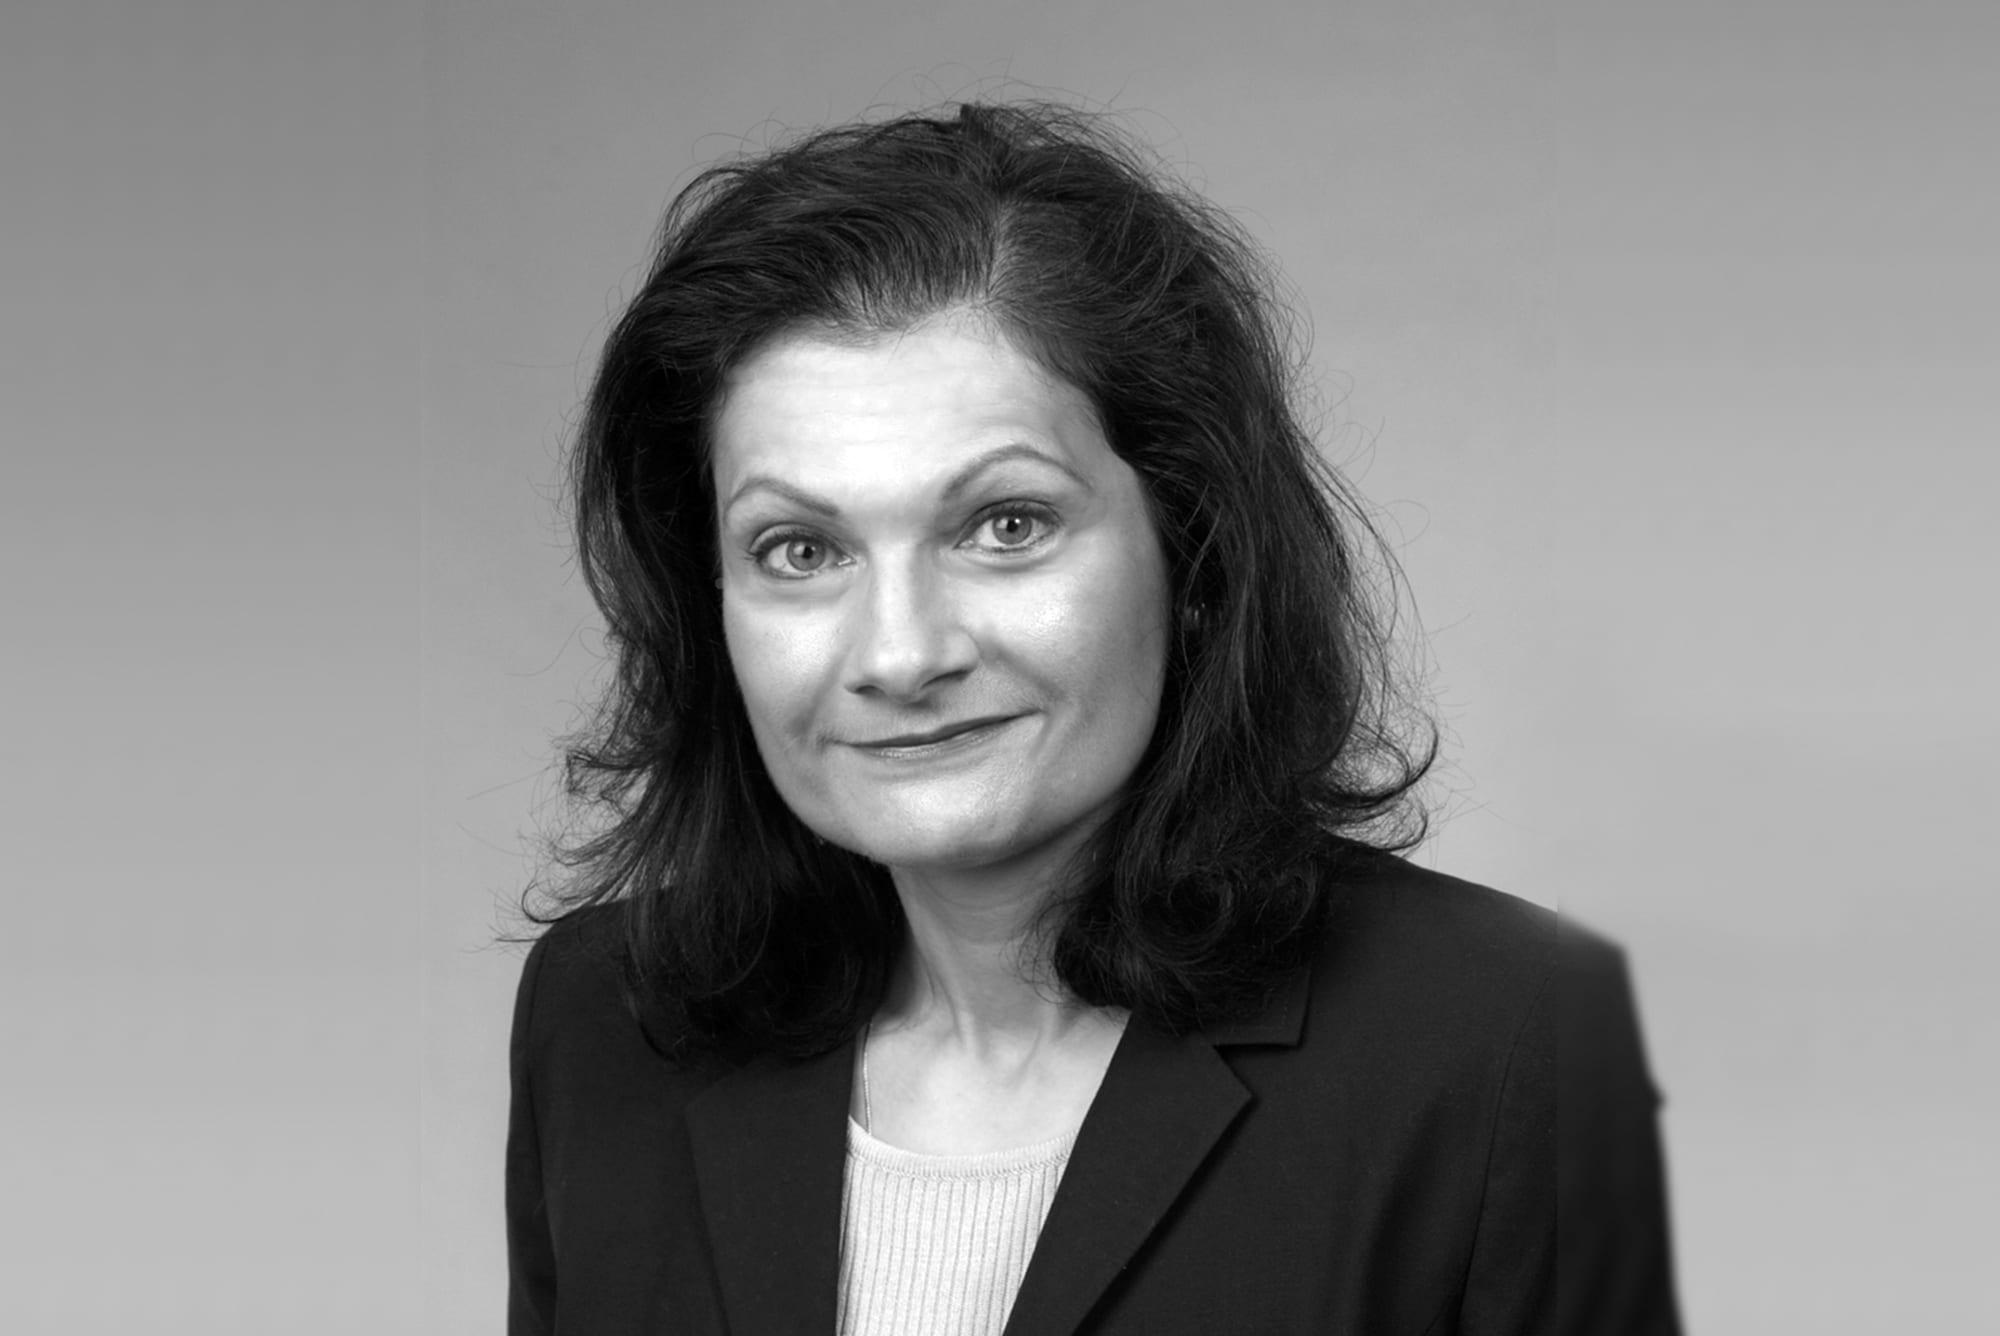 Nancy Petrino